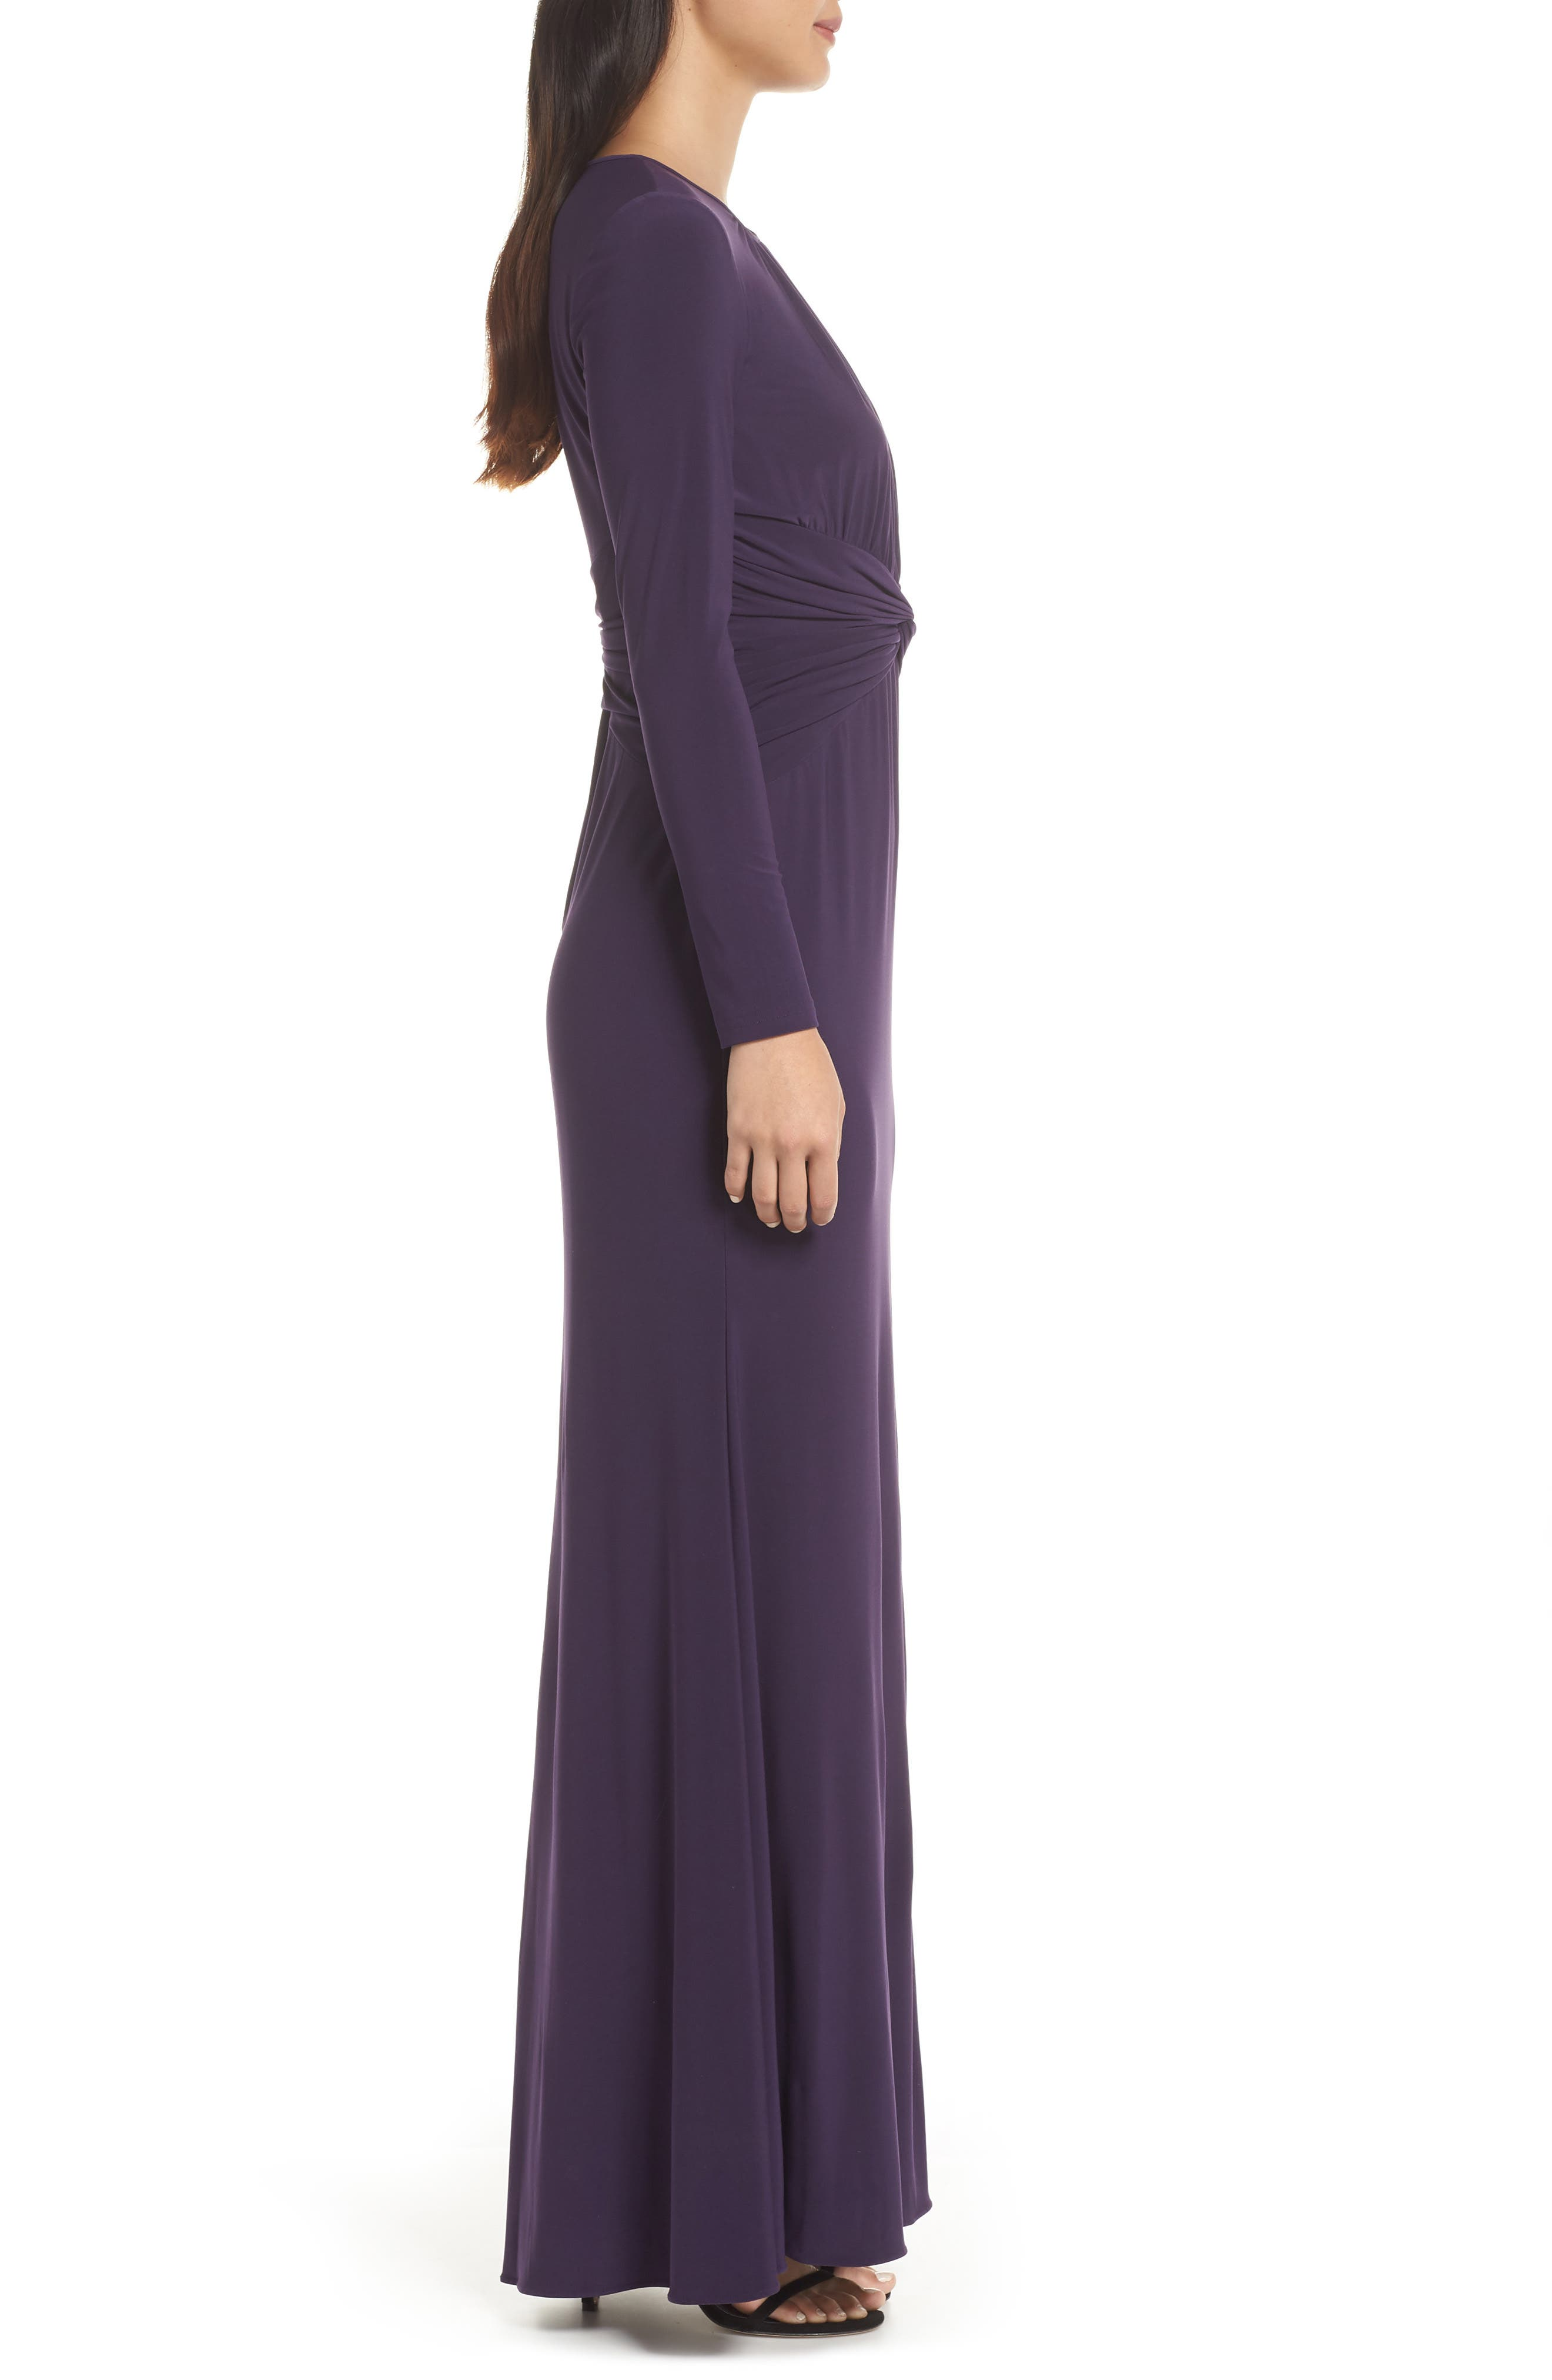 ADRIANNA PAPELL,                             Twist Waist Knit Dress,                             Alternate thumbnail 3, color,                             501